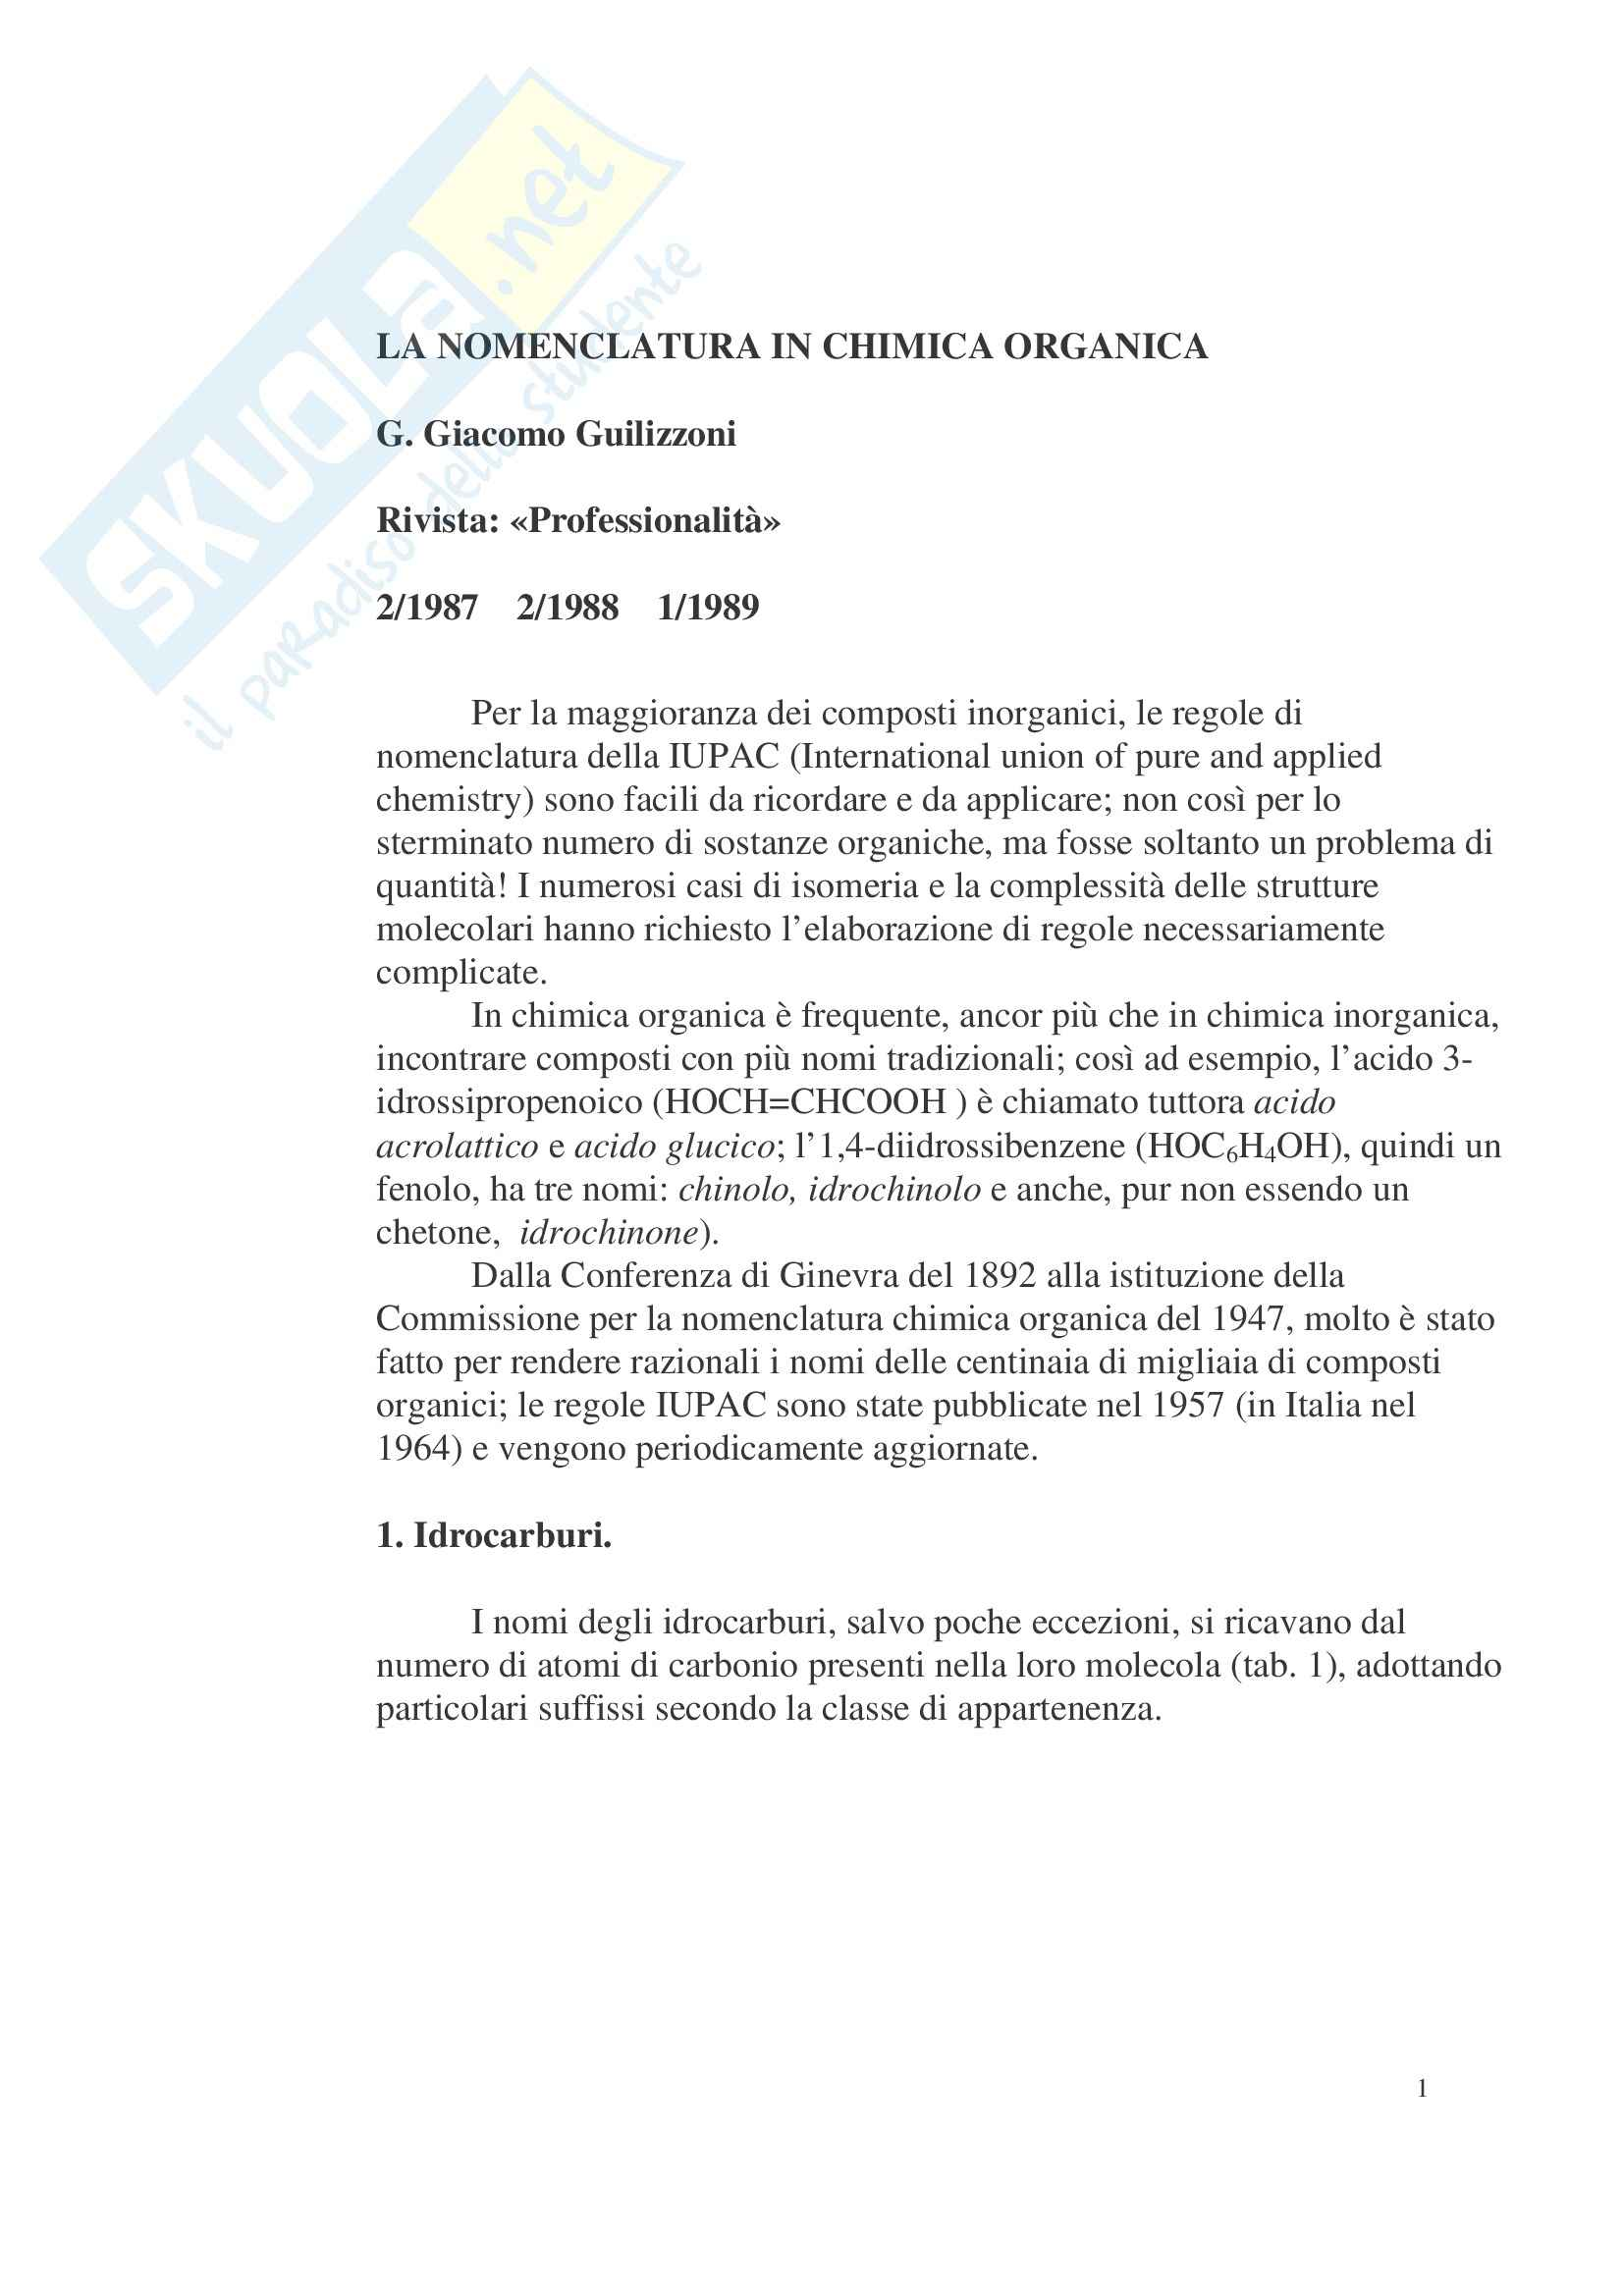 Chimica organica - nomenclatura